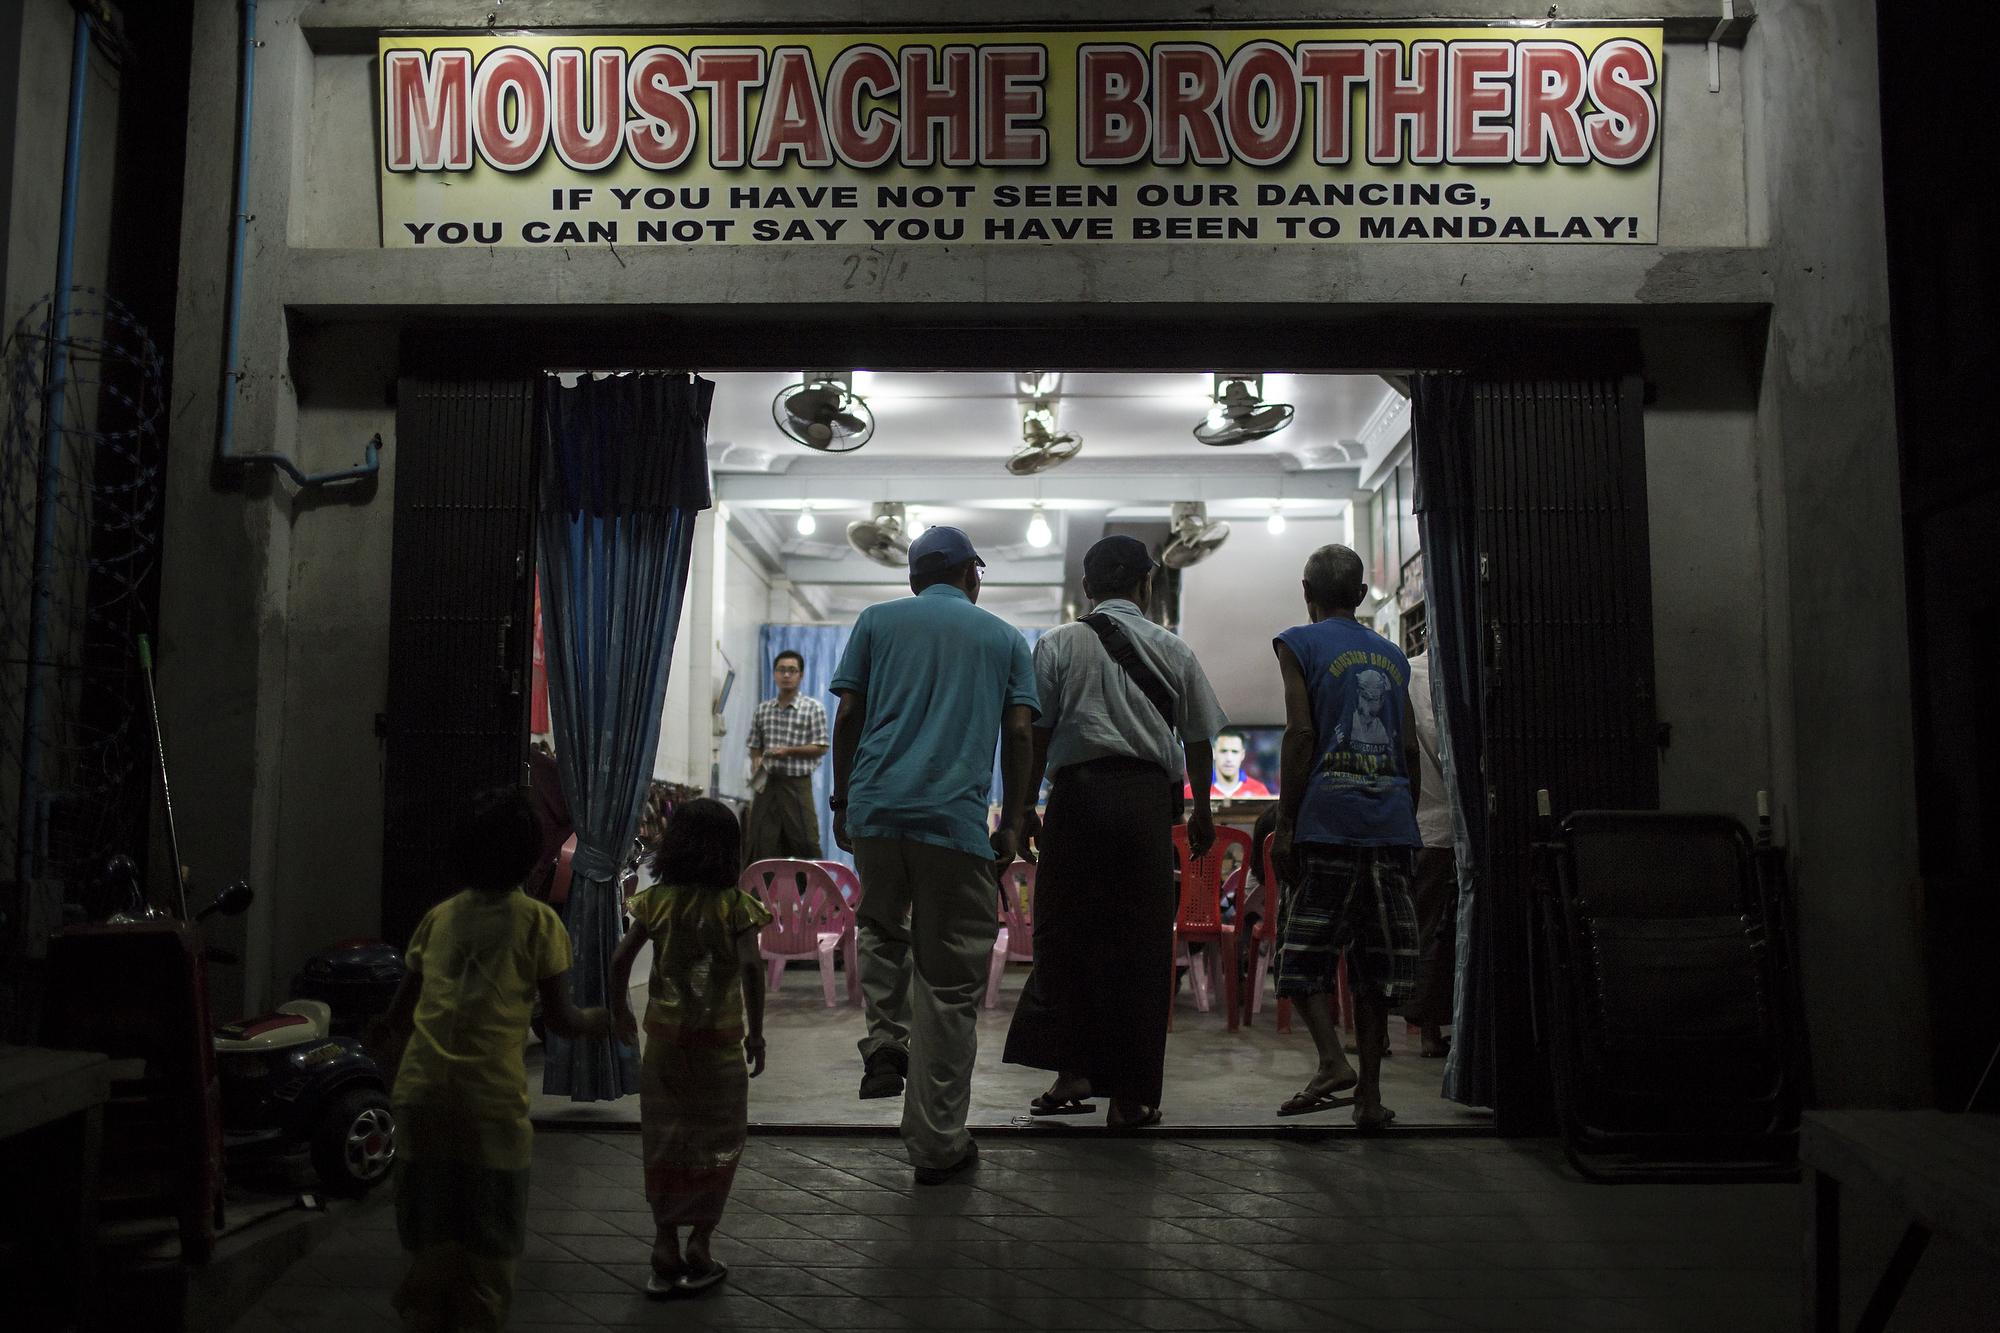 MW_Myanmar_Moustache_Brothers_1518_edit.jpg